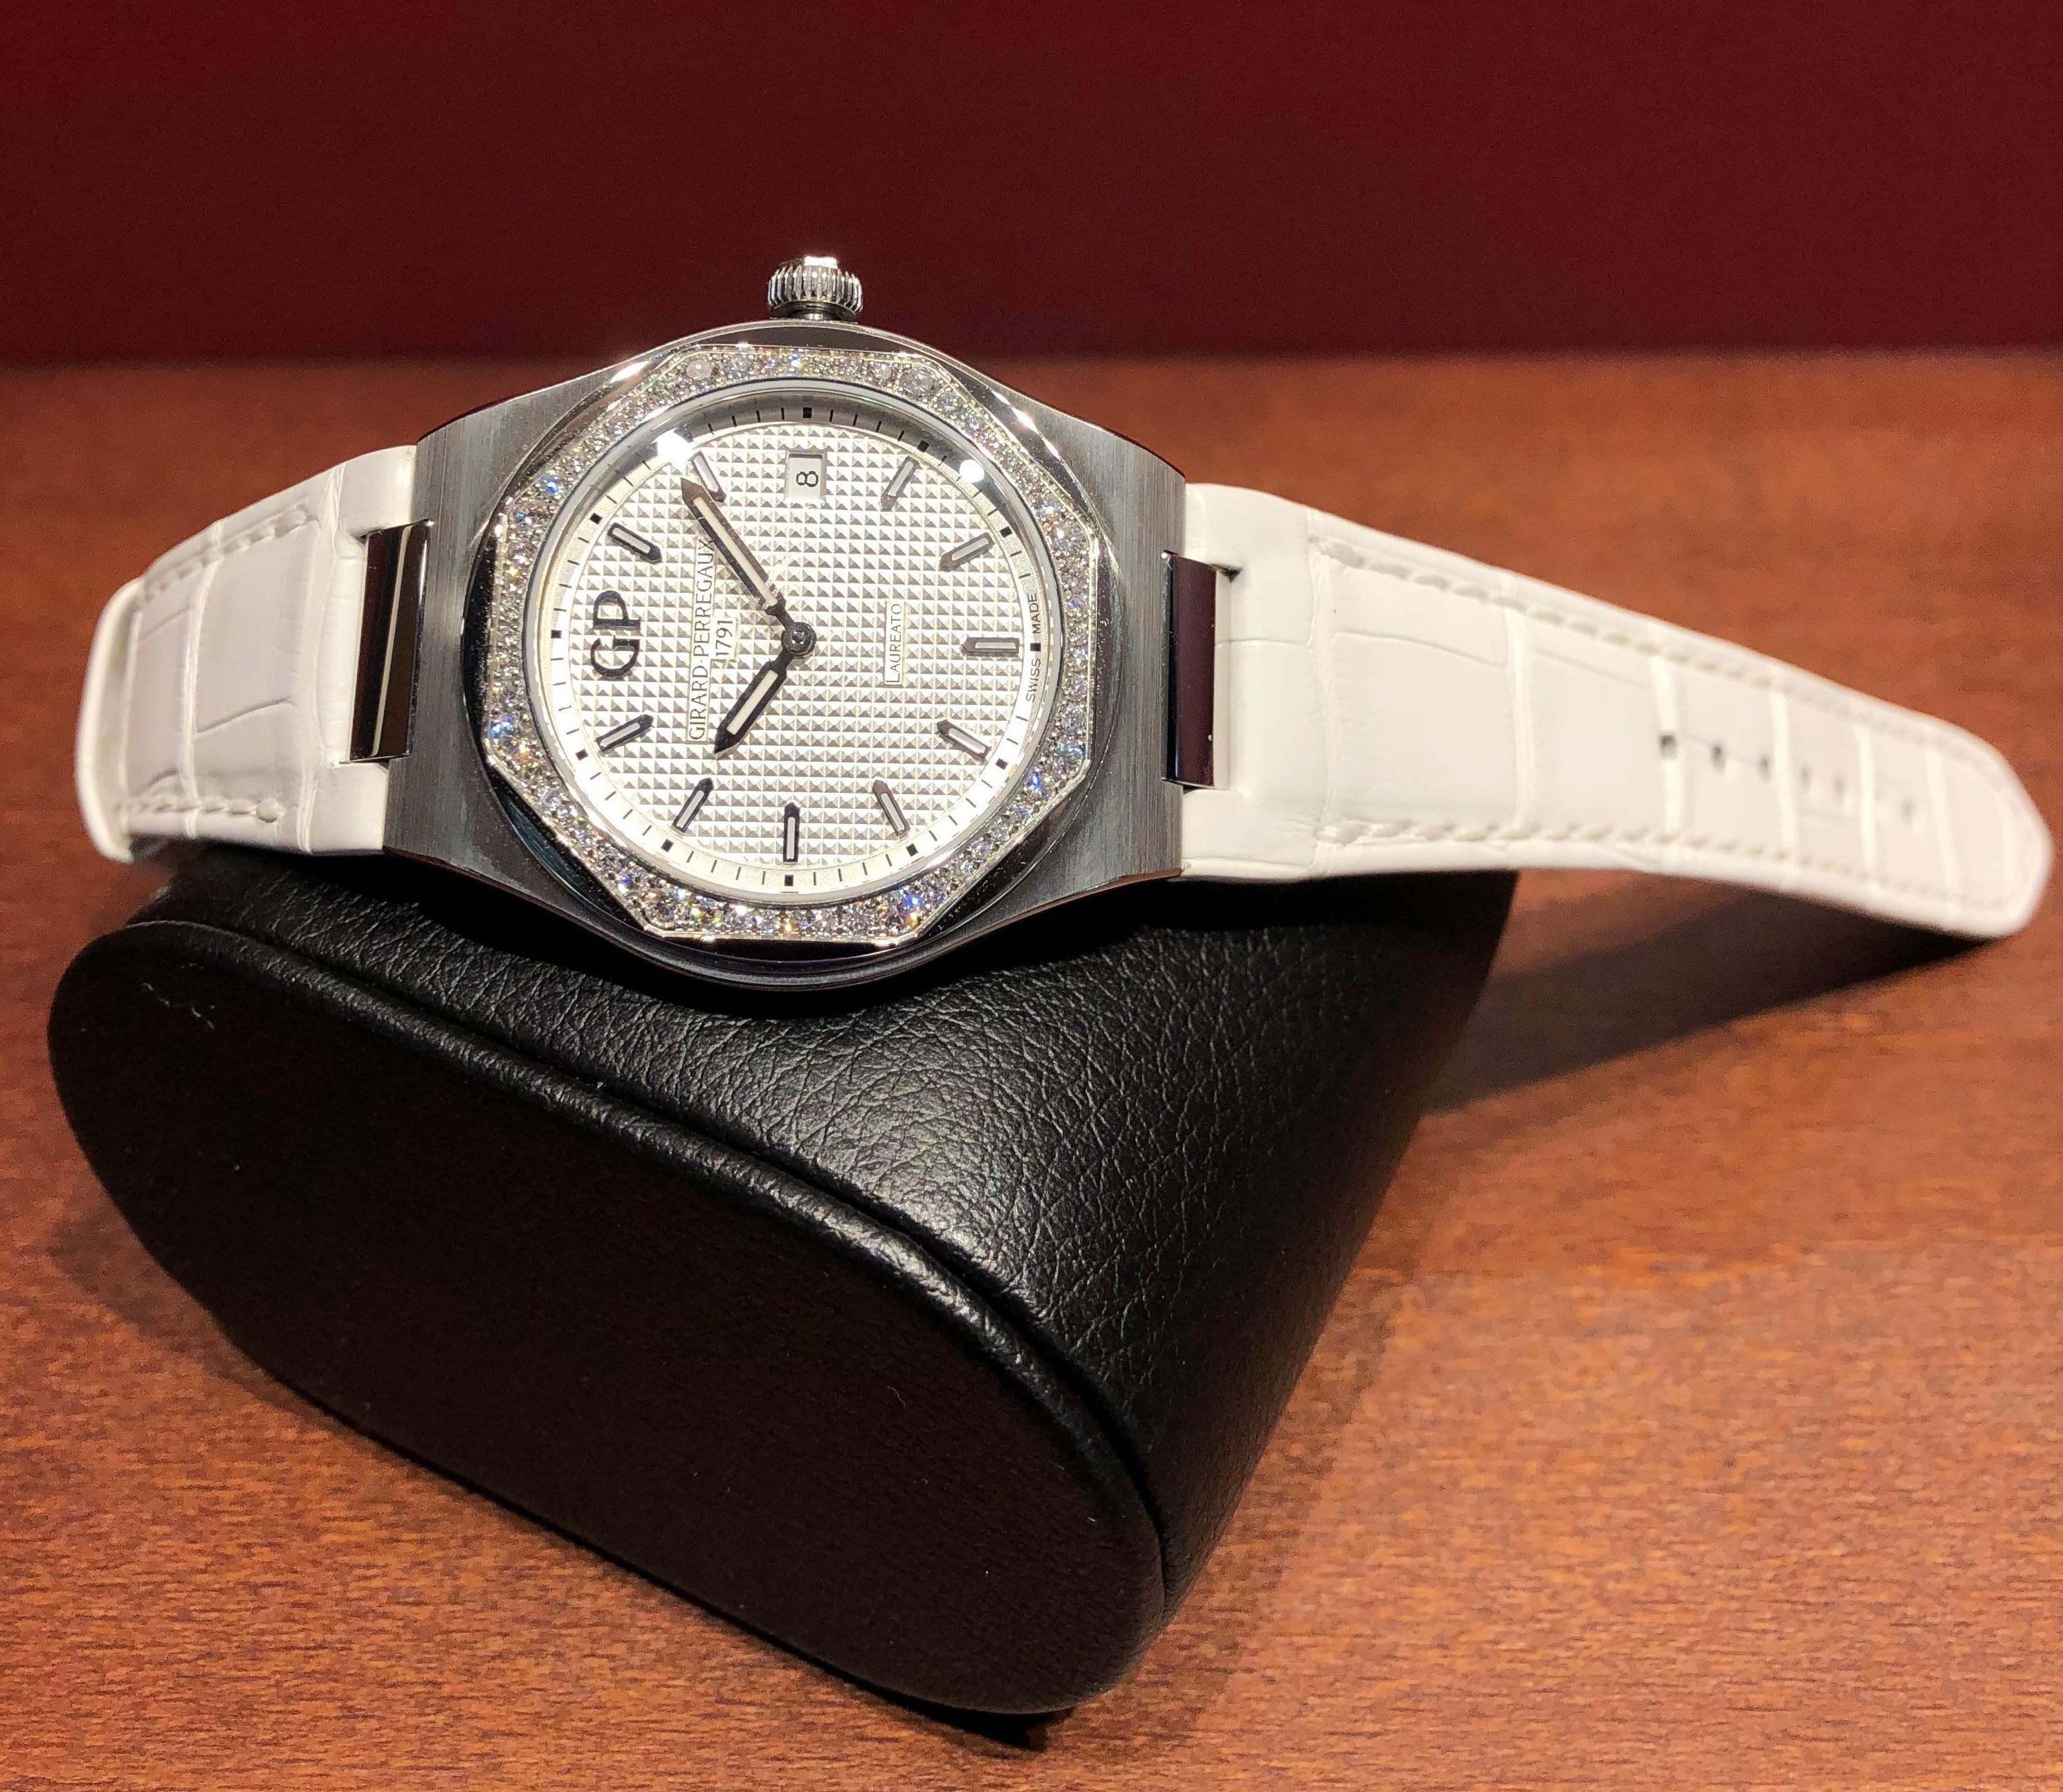 b51f7f1f5 ジラール・ペルゴ(GIRARD-PERREGAUX) ロレア―ト34MM   ブランド腕時計の正規販売店紹介サイトGressive/グレッシブ